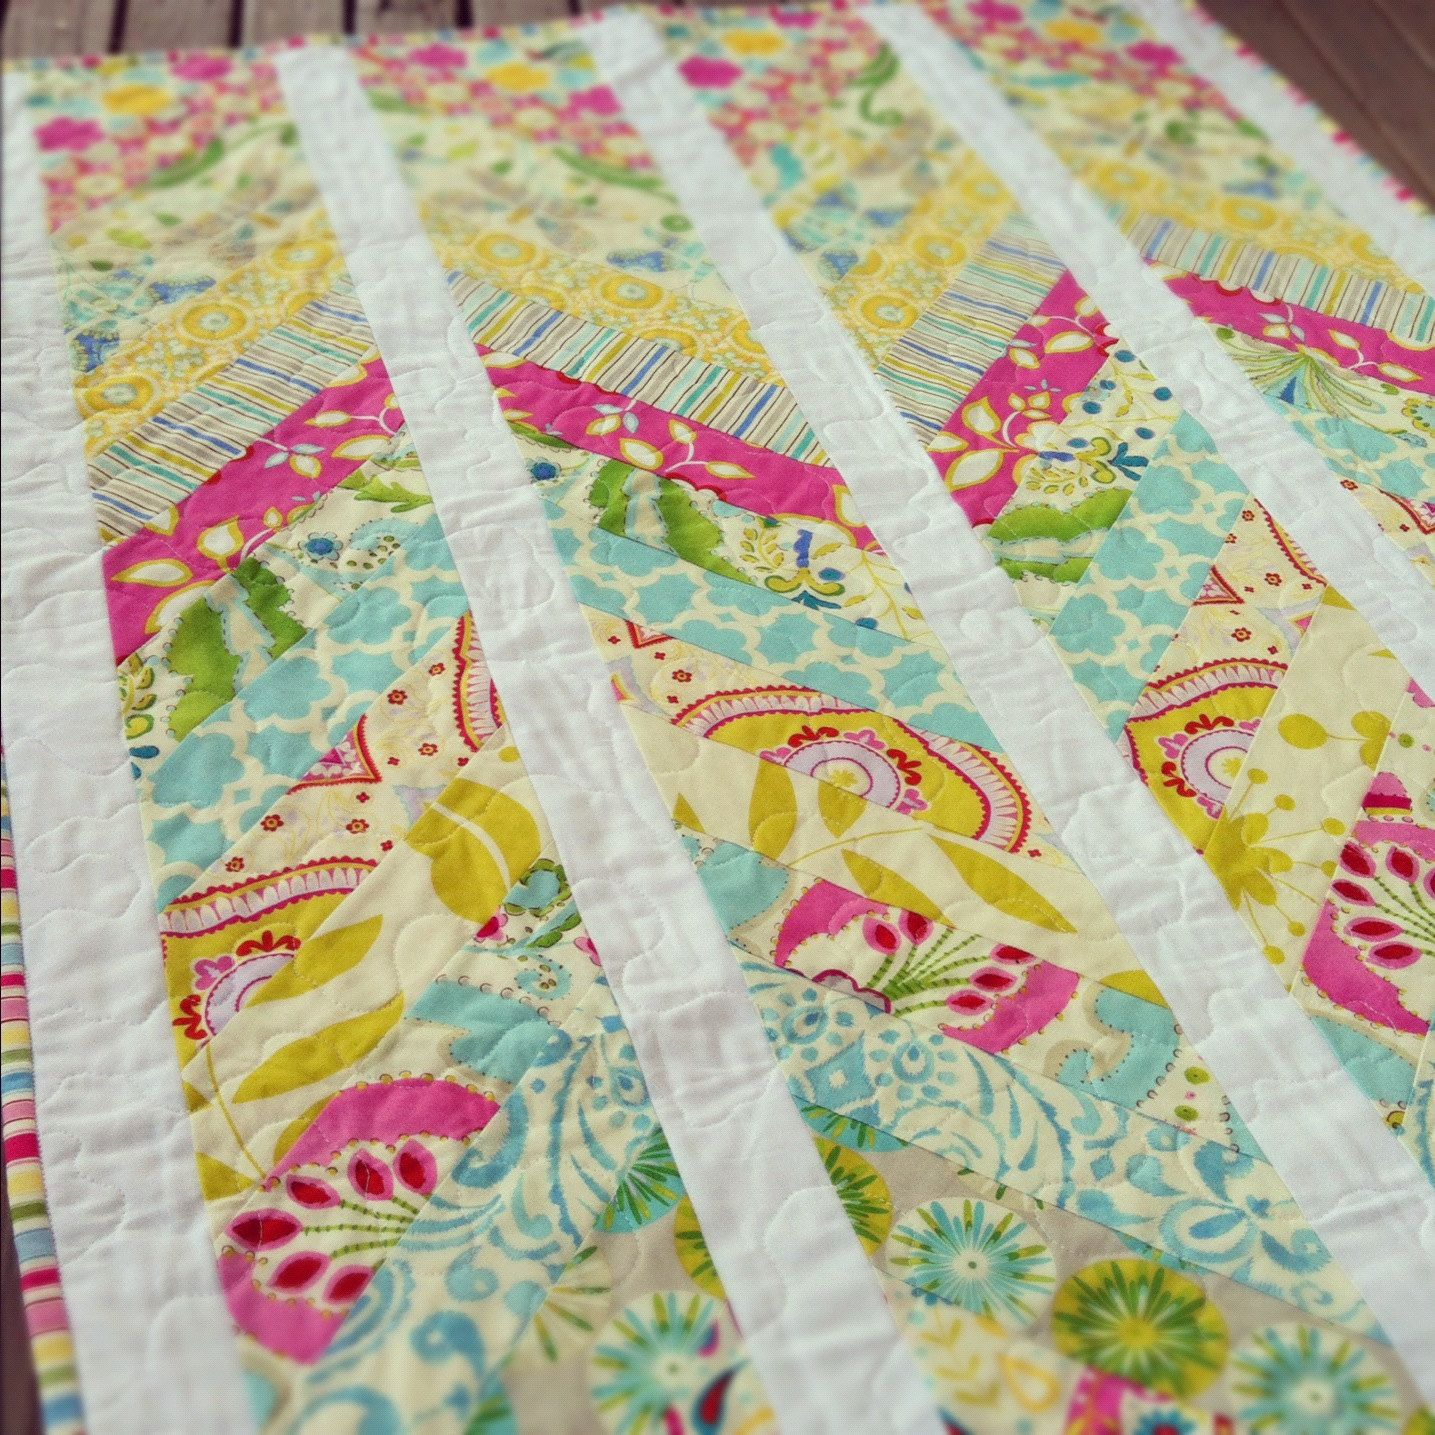 Custom Handmade Chevron Modern Cot Crib Patchwork Quilt in your ... : make your own patchwork quilt - Adamdwight.com